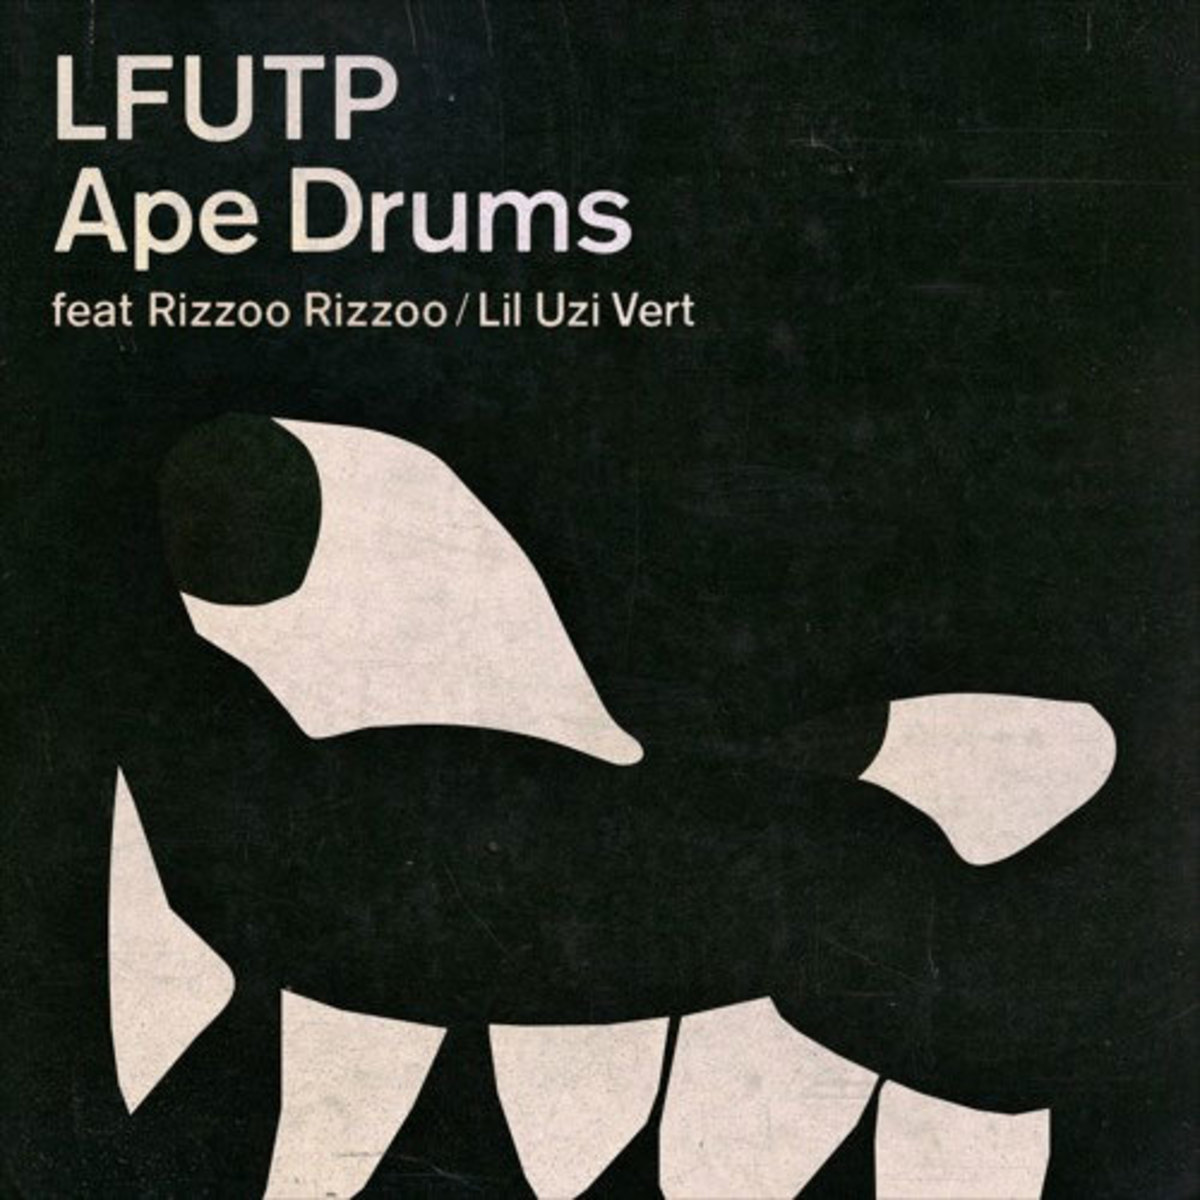 ape-drums-lfutp.jpg